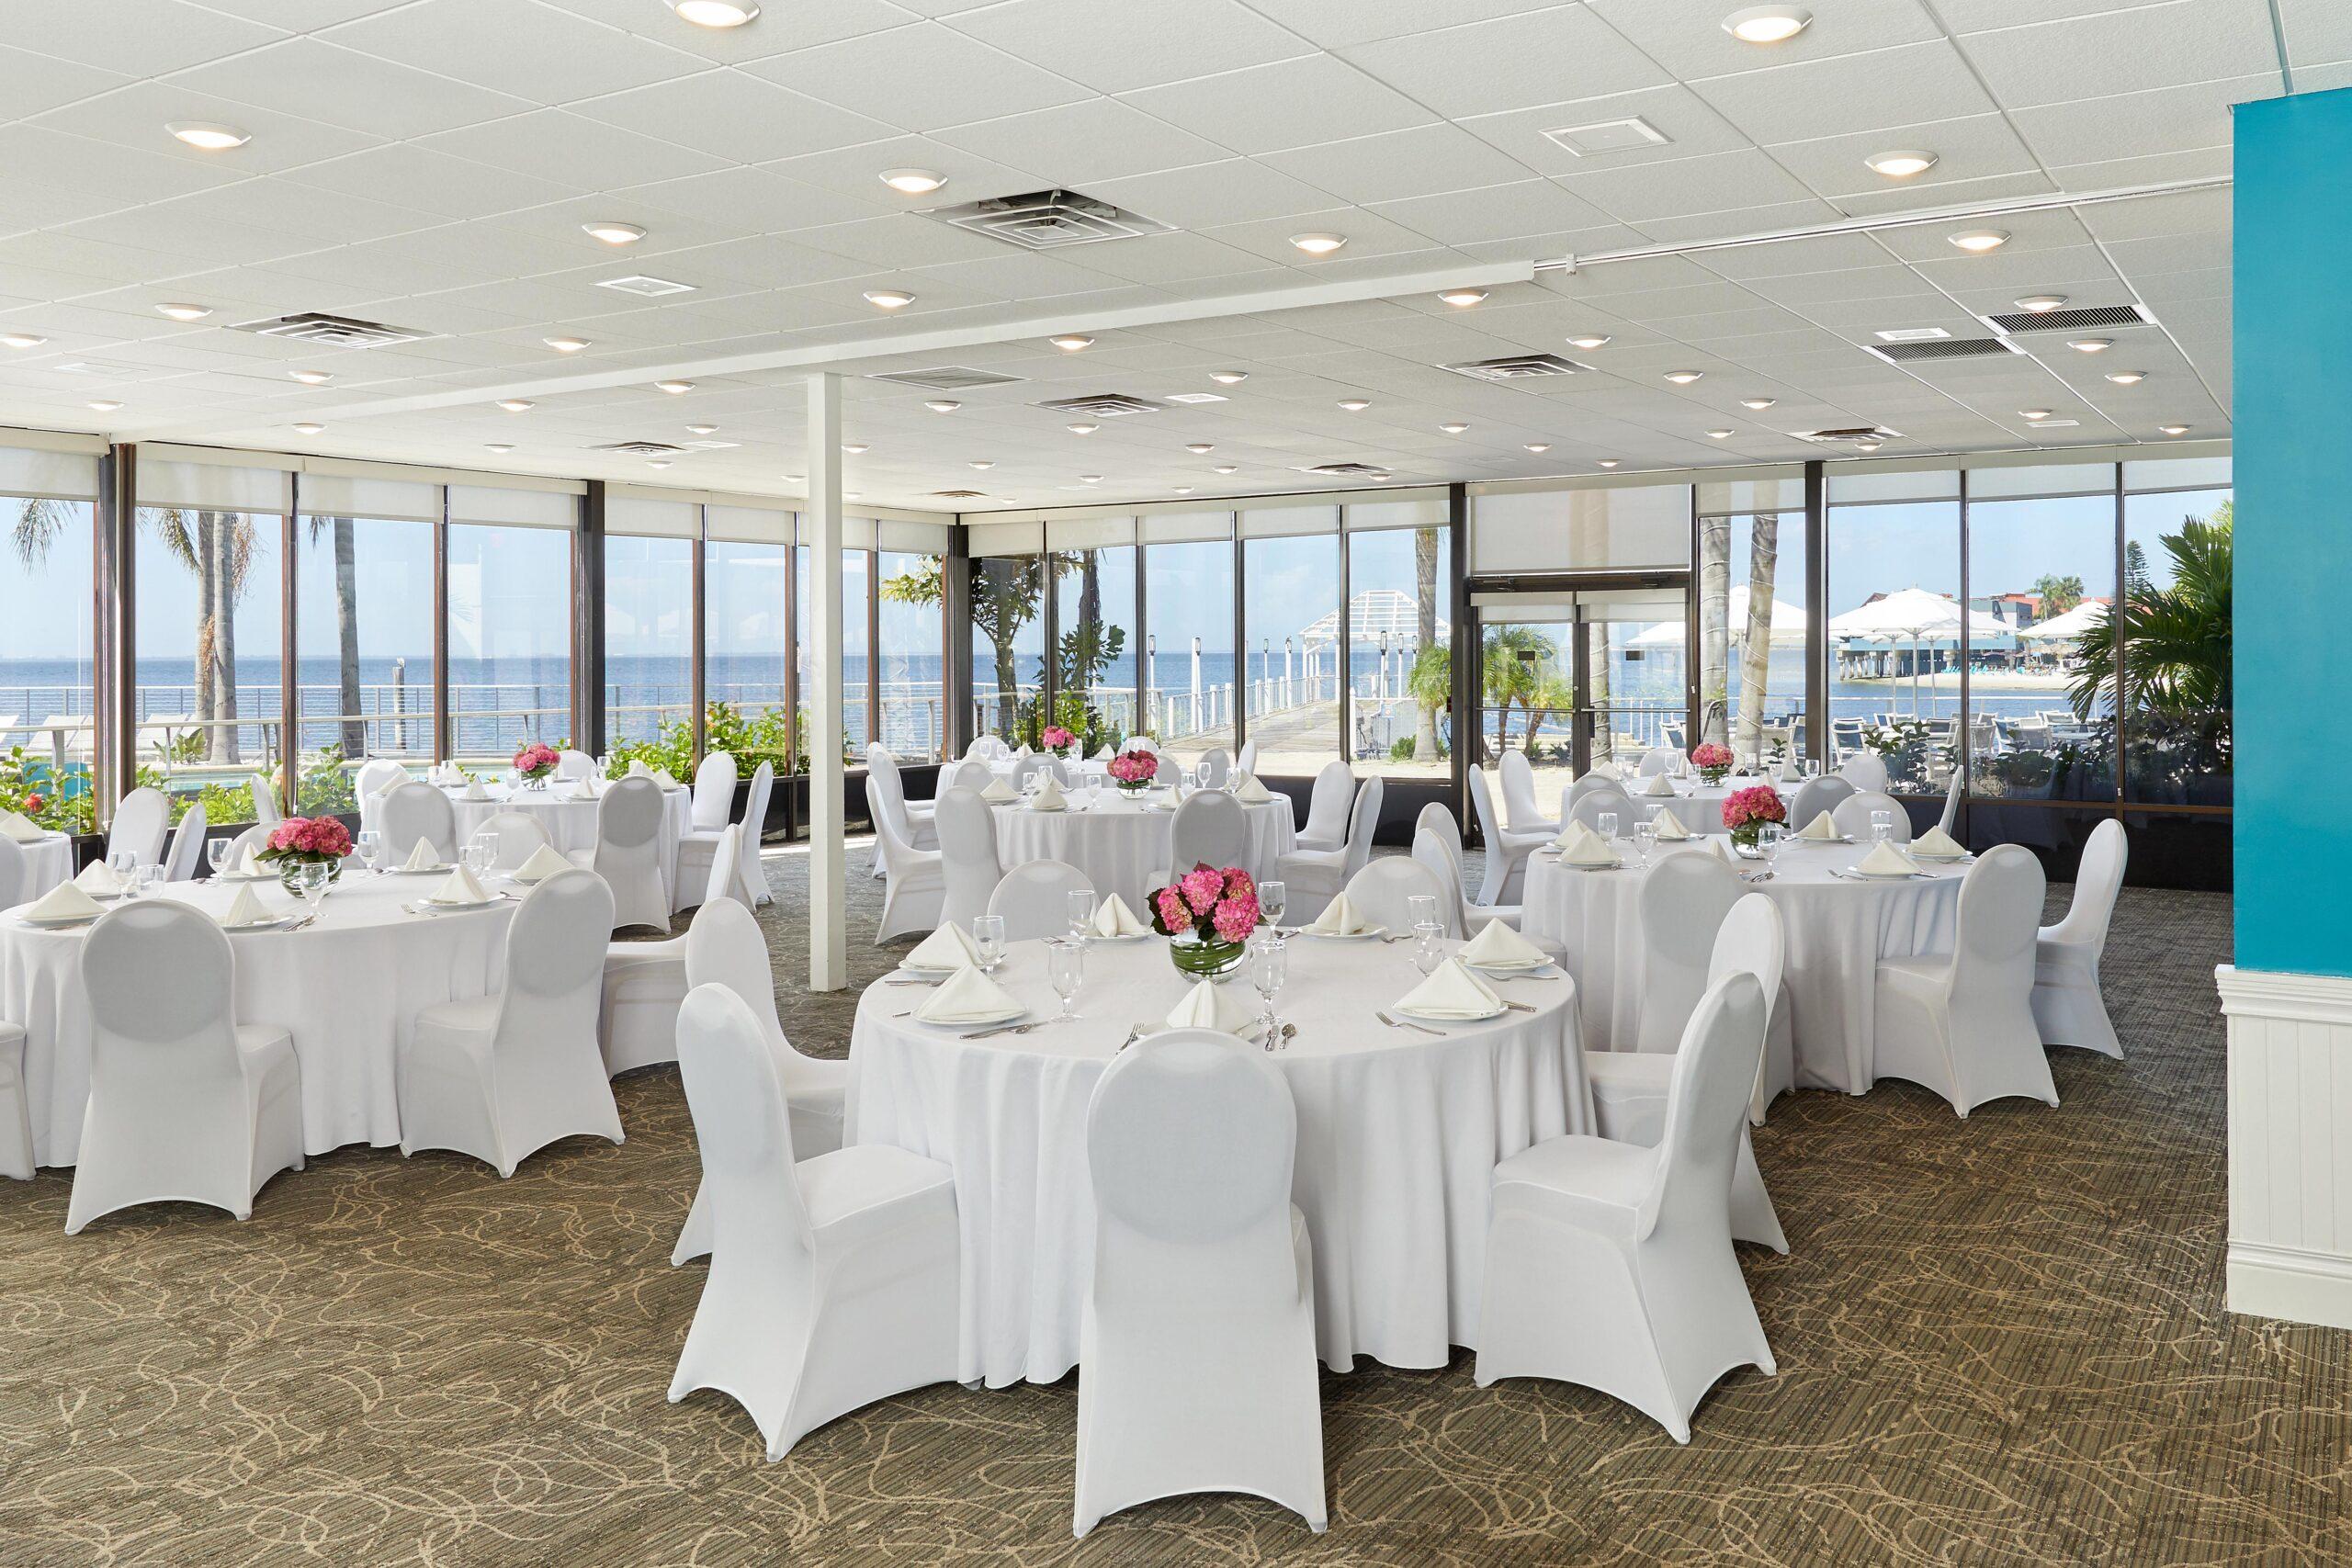 Godfrey tampa banquet room